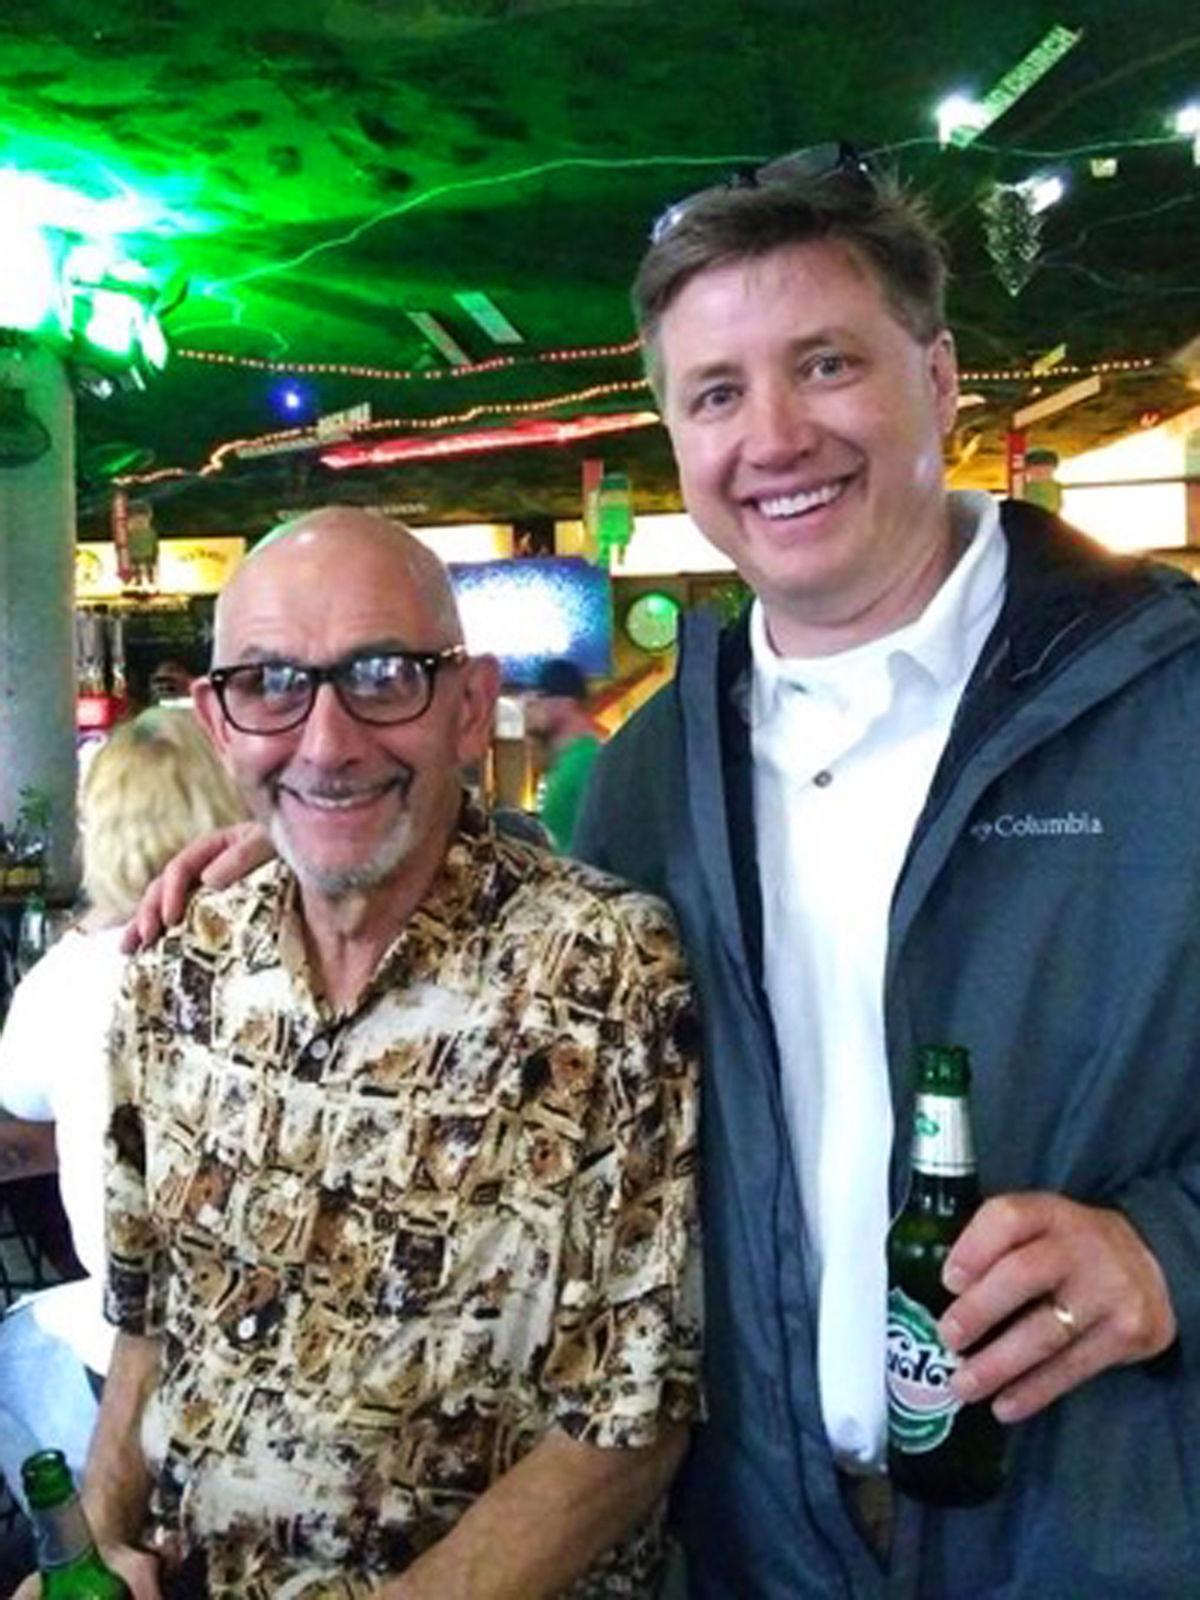 Ray Amelio and Todd DePastino